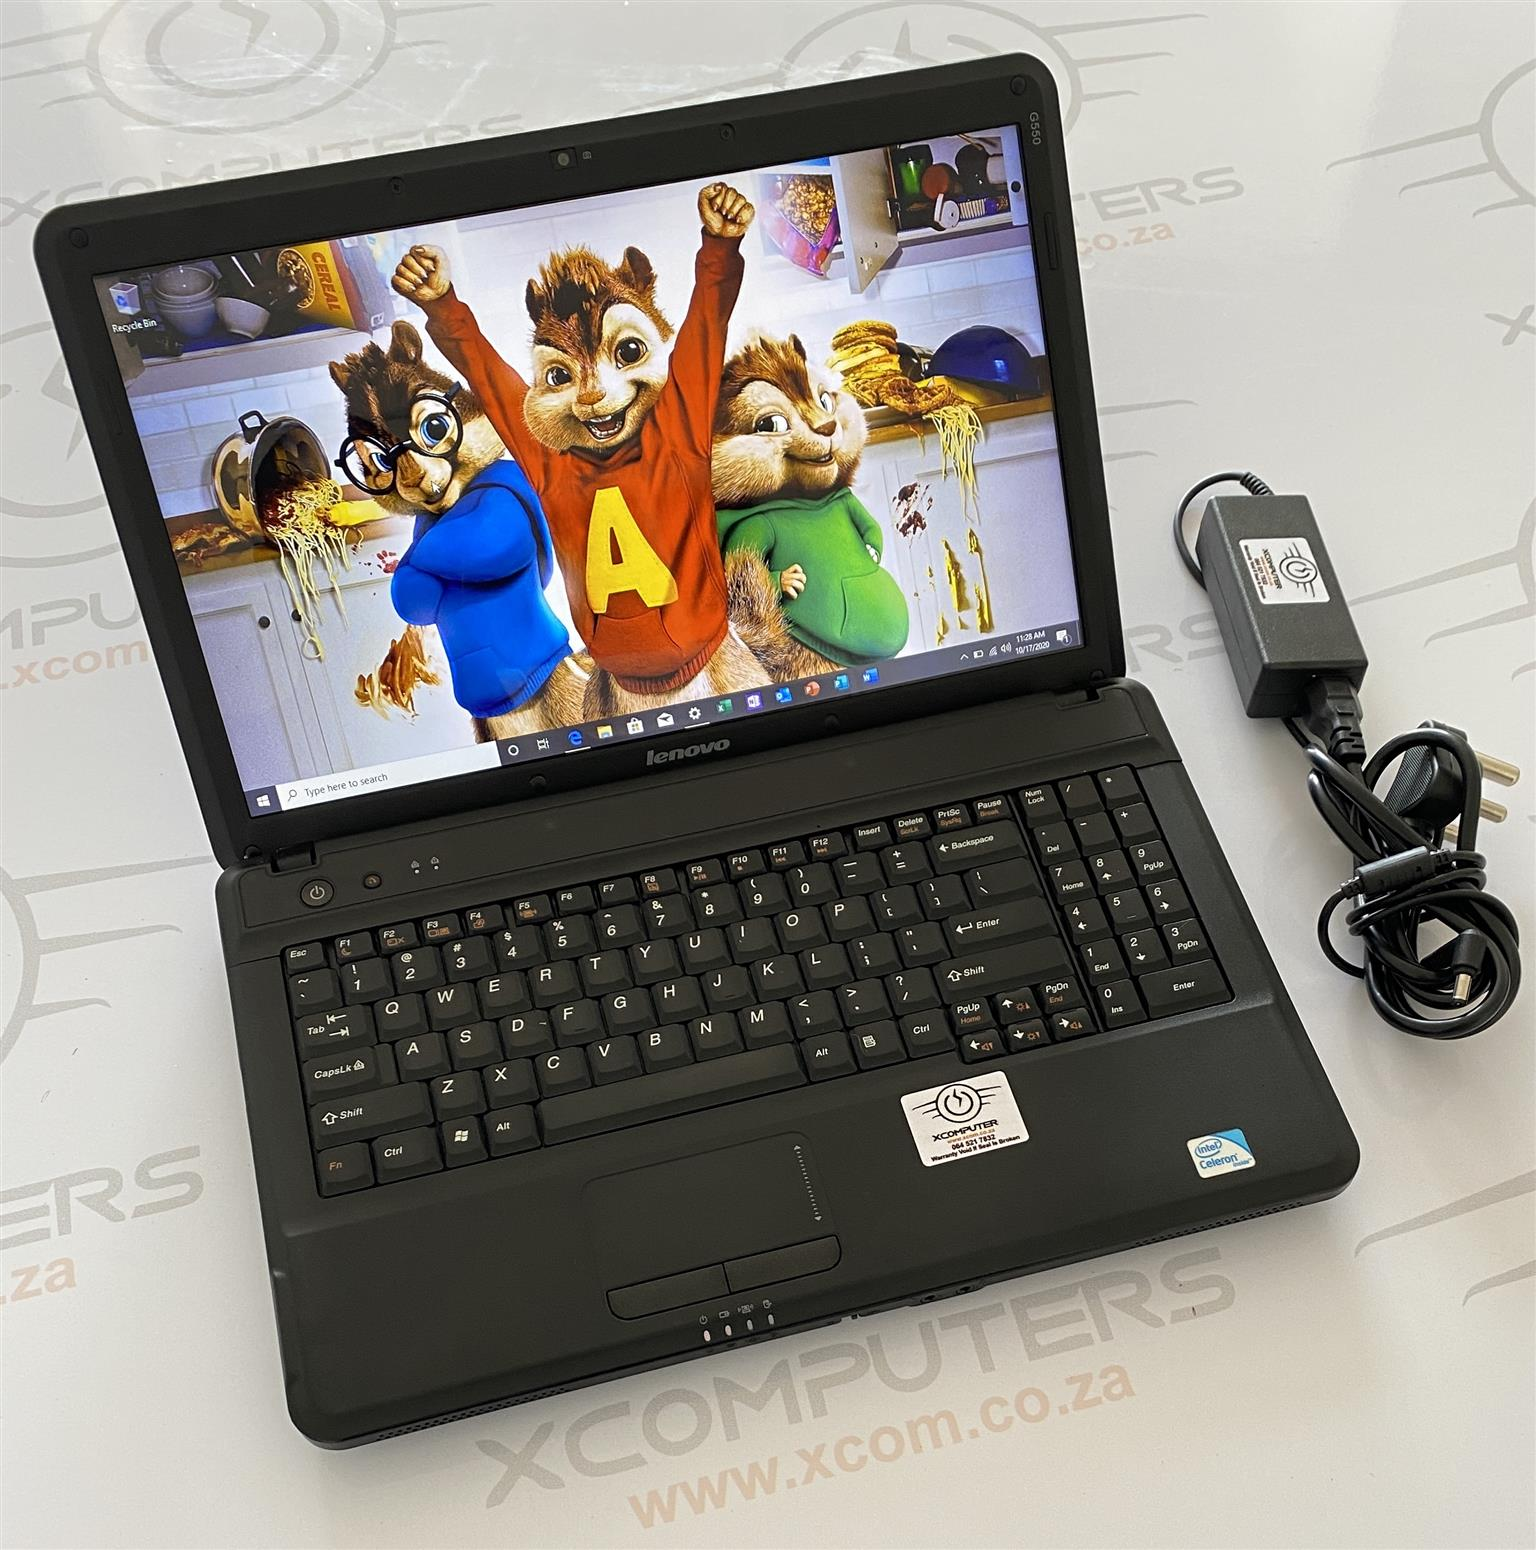 Lenovo G550 Intel Celeron Laptop